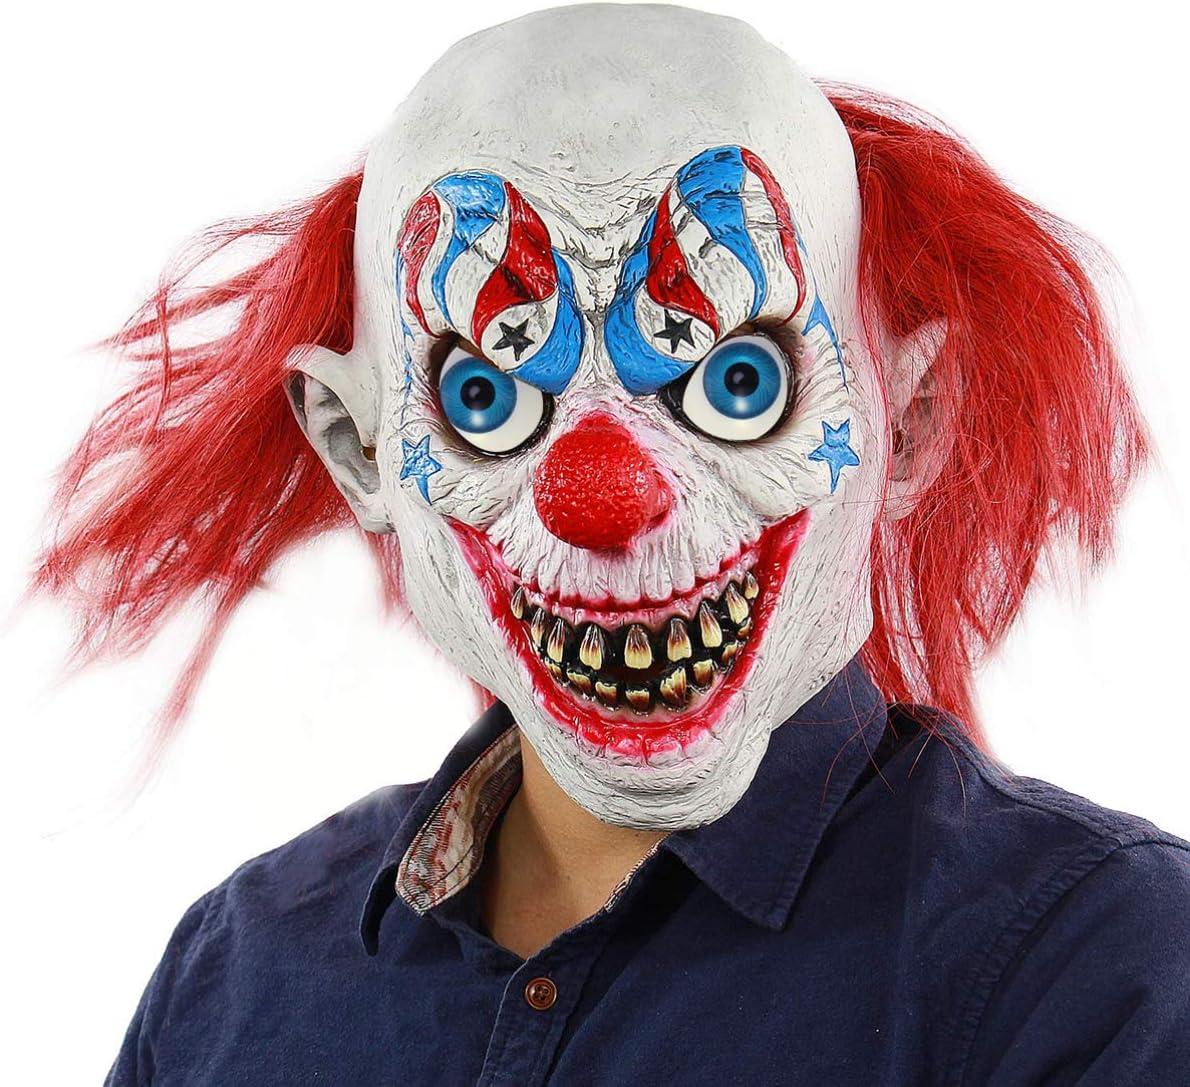 Halloween Eyeballs Horror Props Plastic Eyeballs for Halloween Decoration Party DIY Cosplay, 8PCS